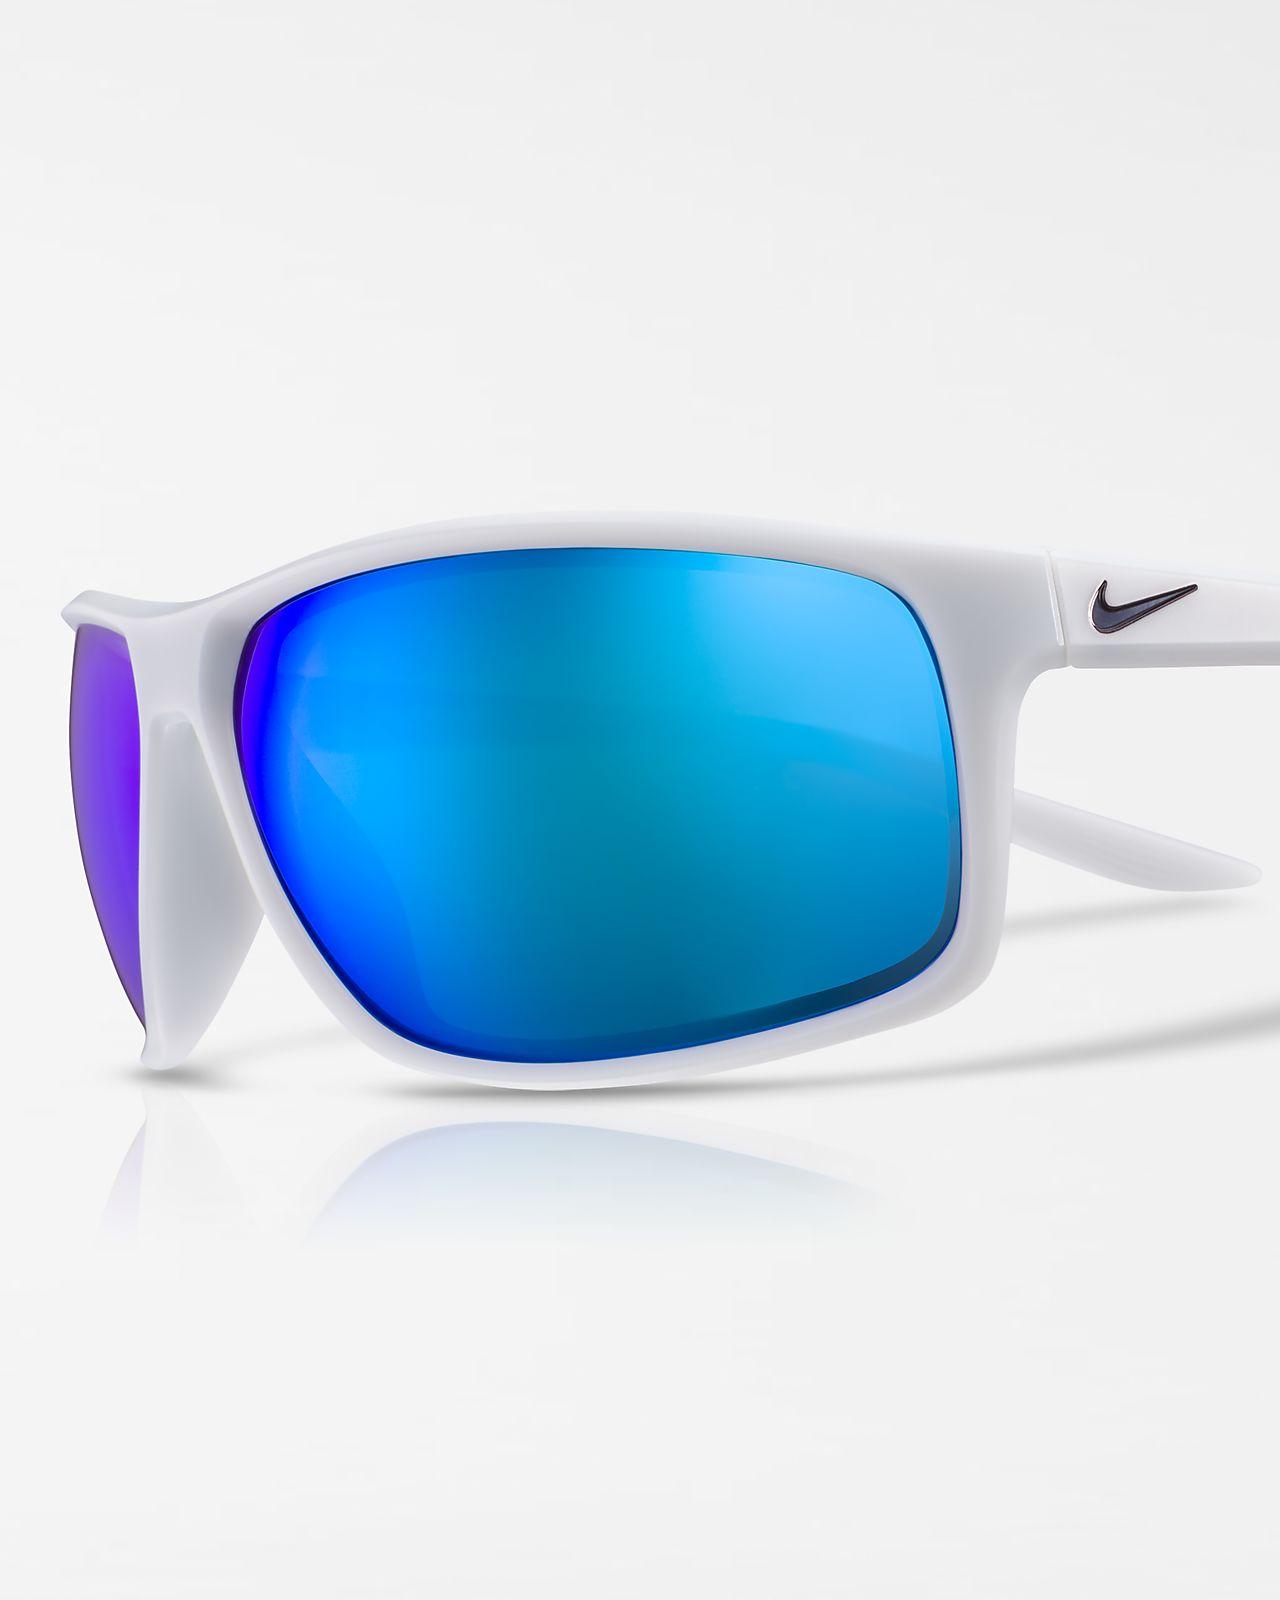 Nike Adrenaline Sunglasses